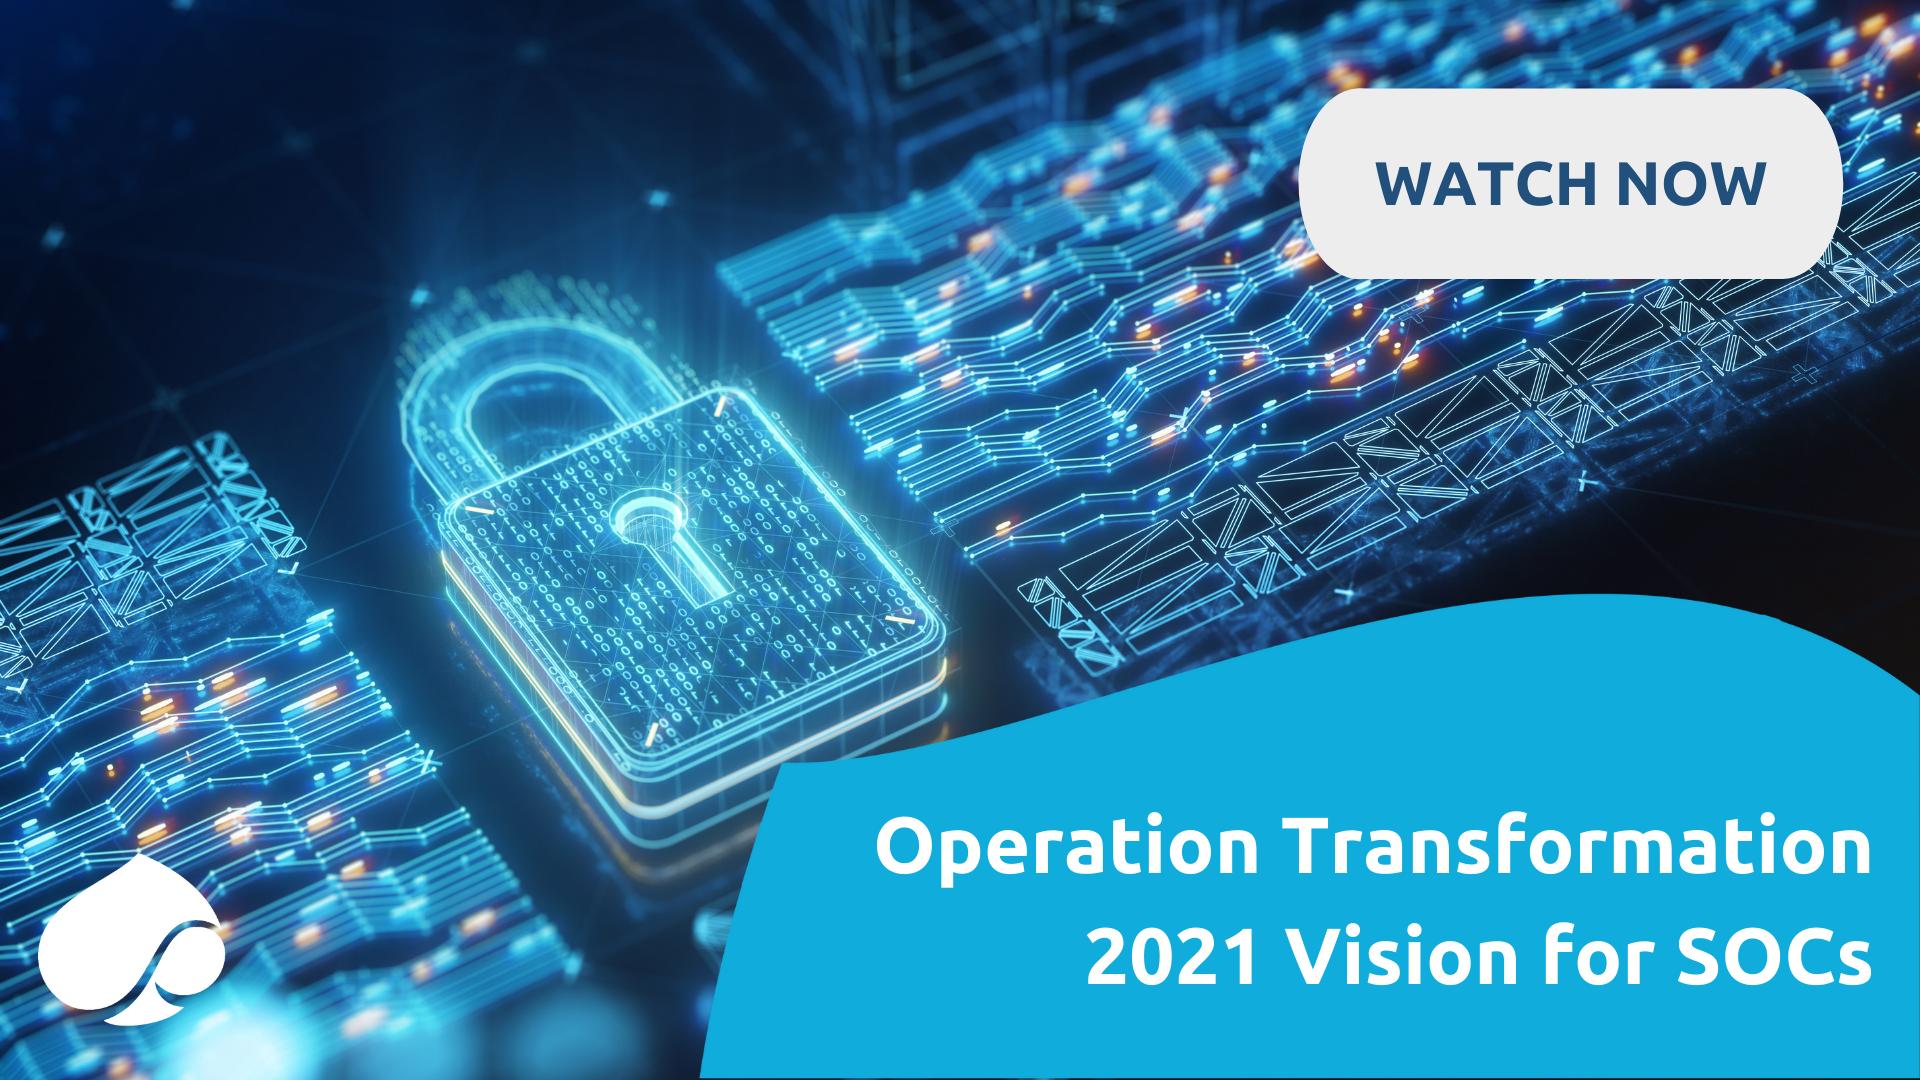 Operation Transformation 2021 Vision for SOCs2